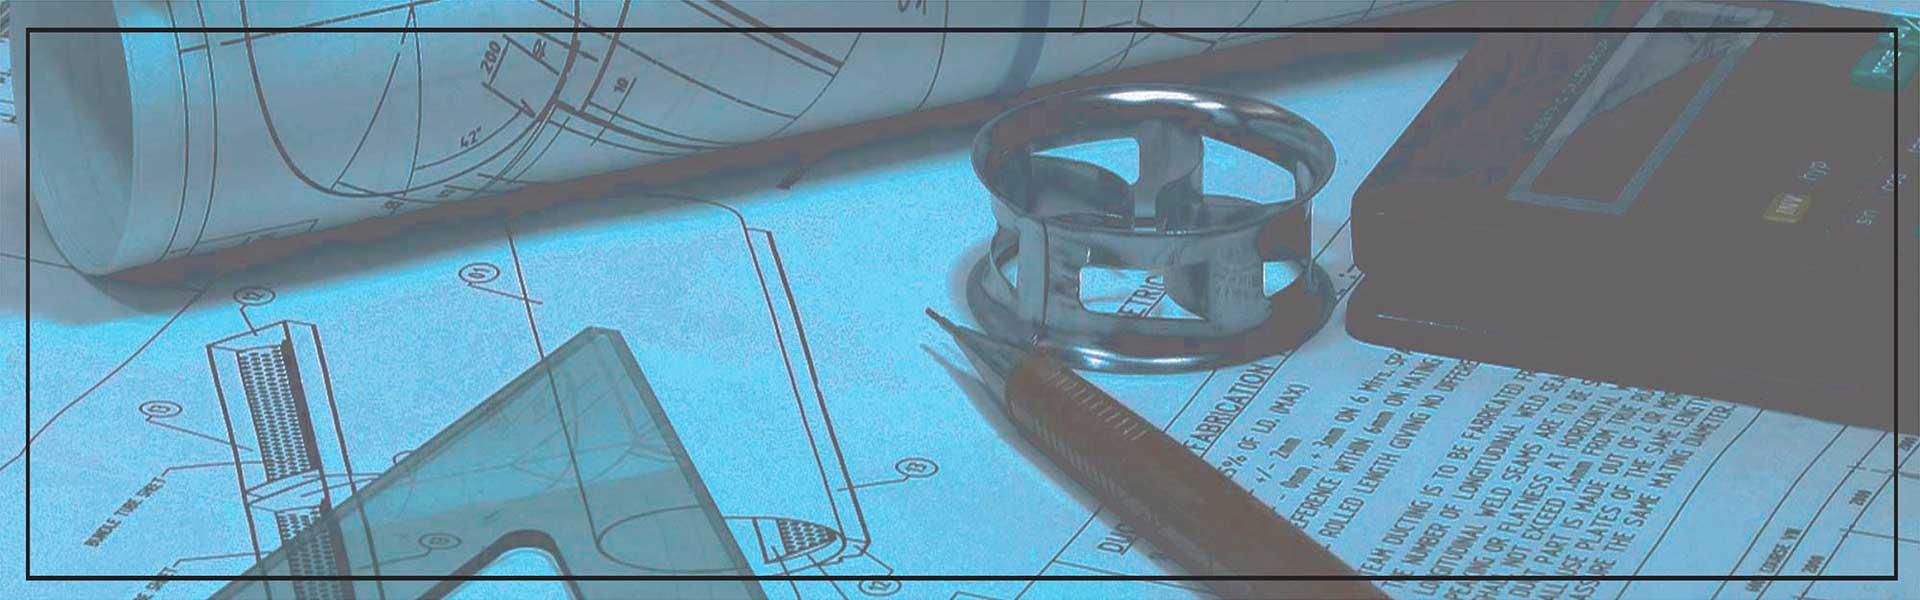 mechanicaEngineering12